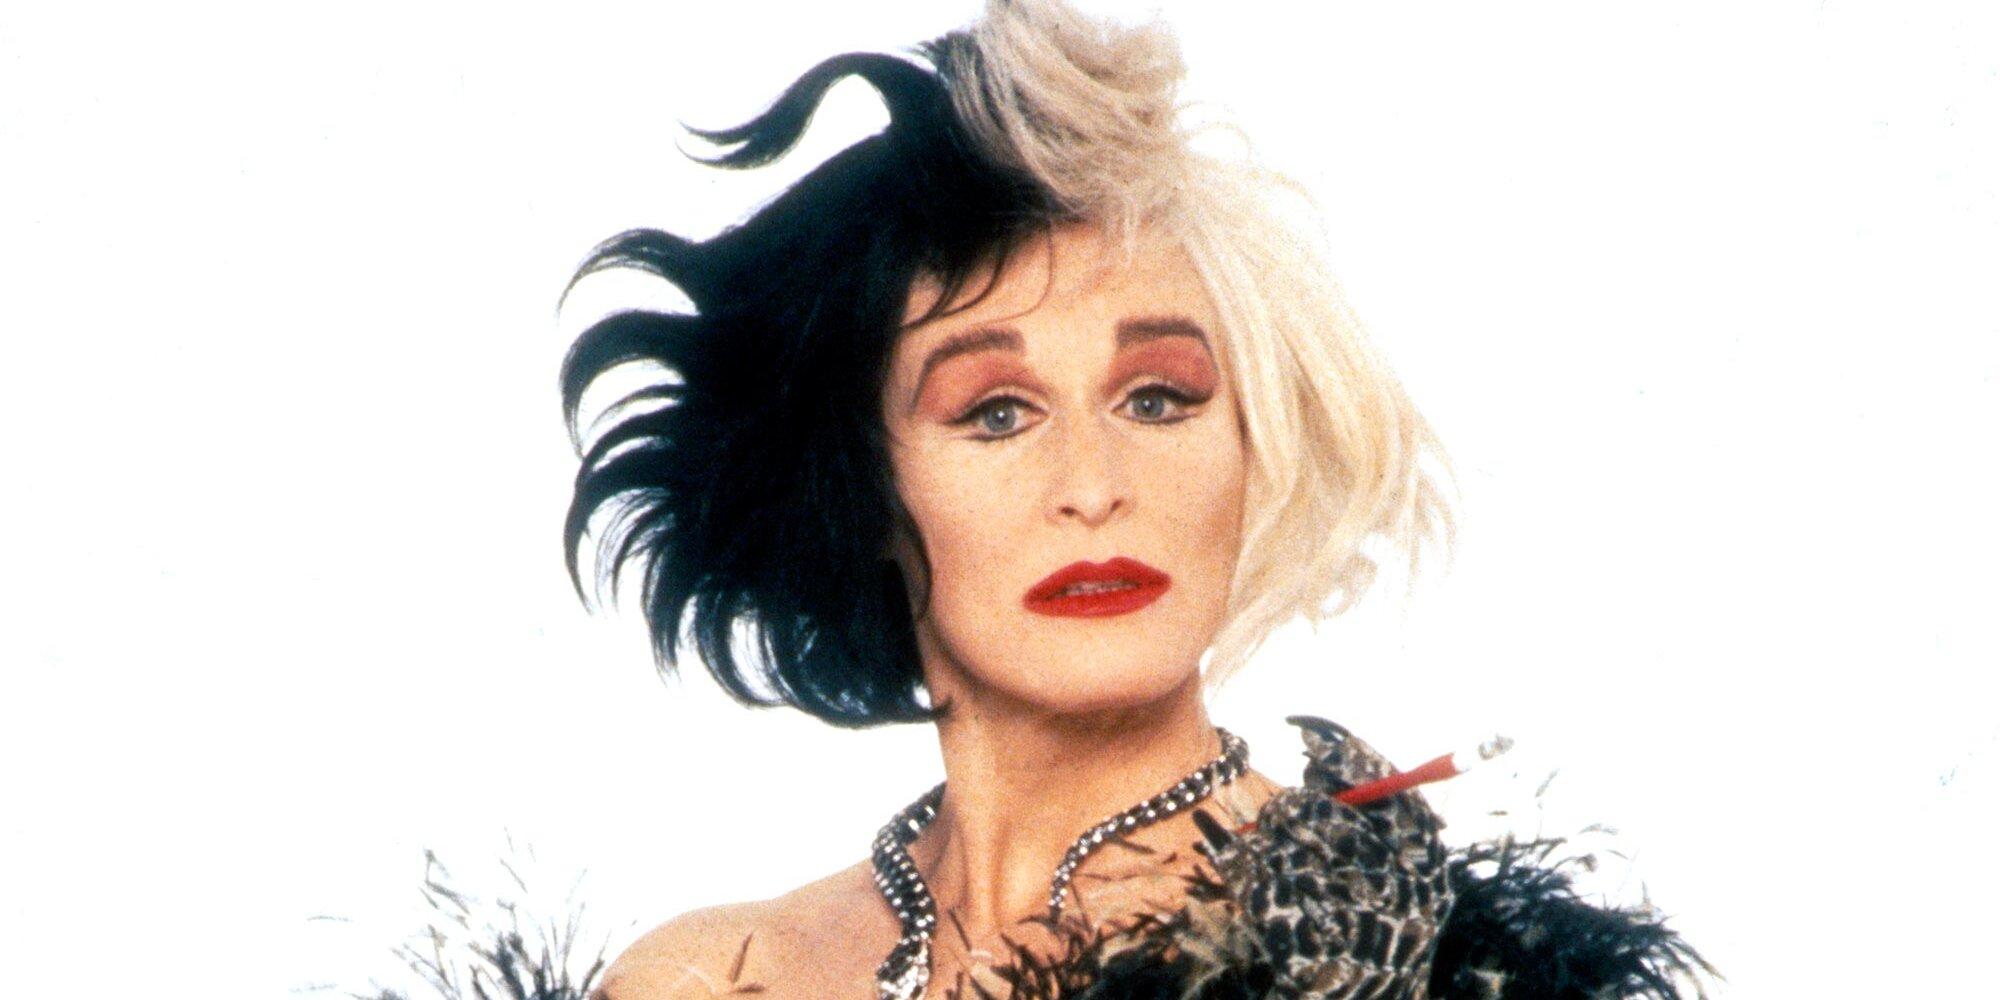 Glenn Close pitches Cruella de Vil sequel idea set in the sewers of NYC